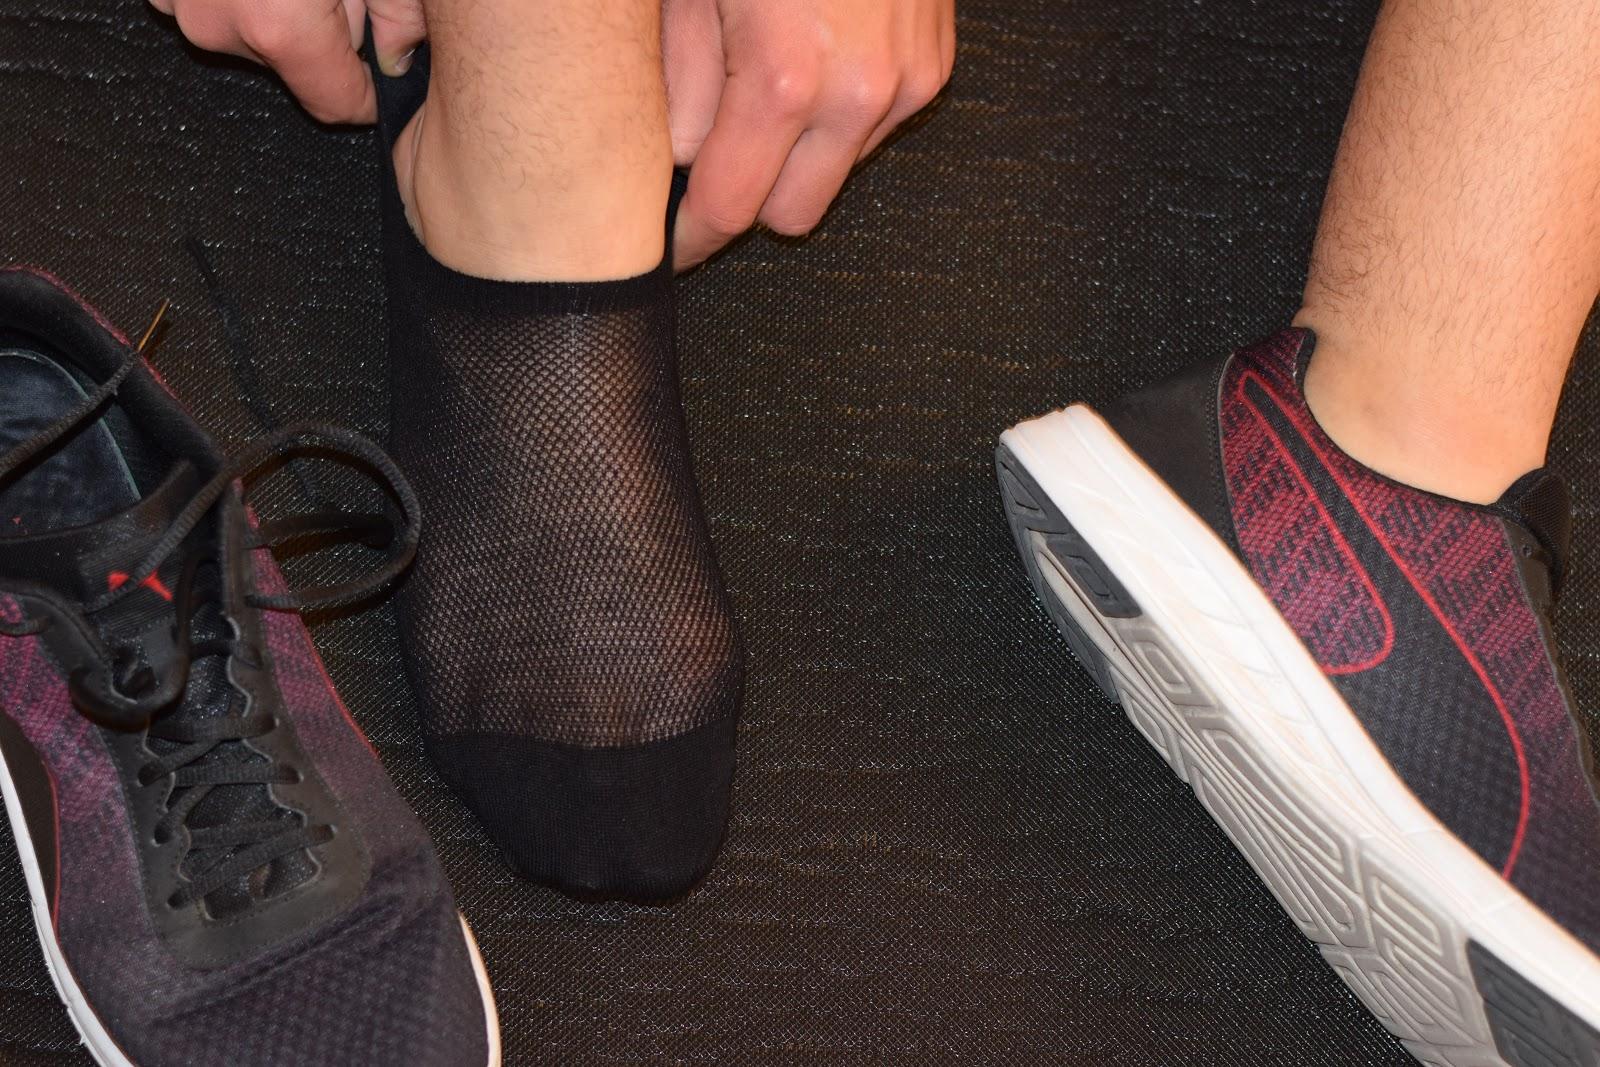 calzini per praticare sport